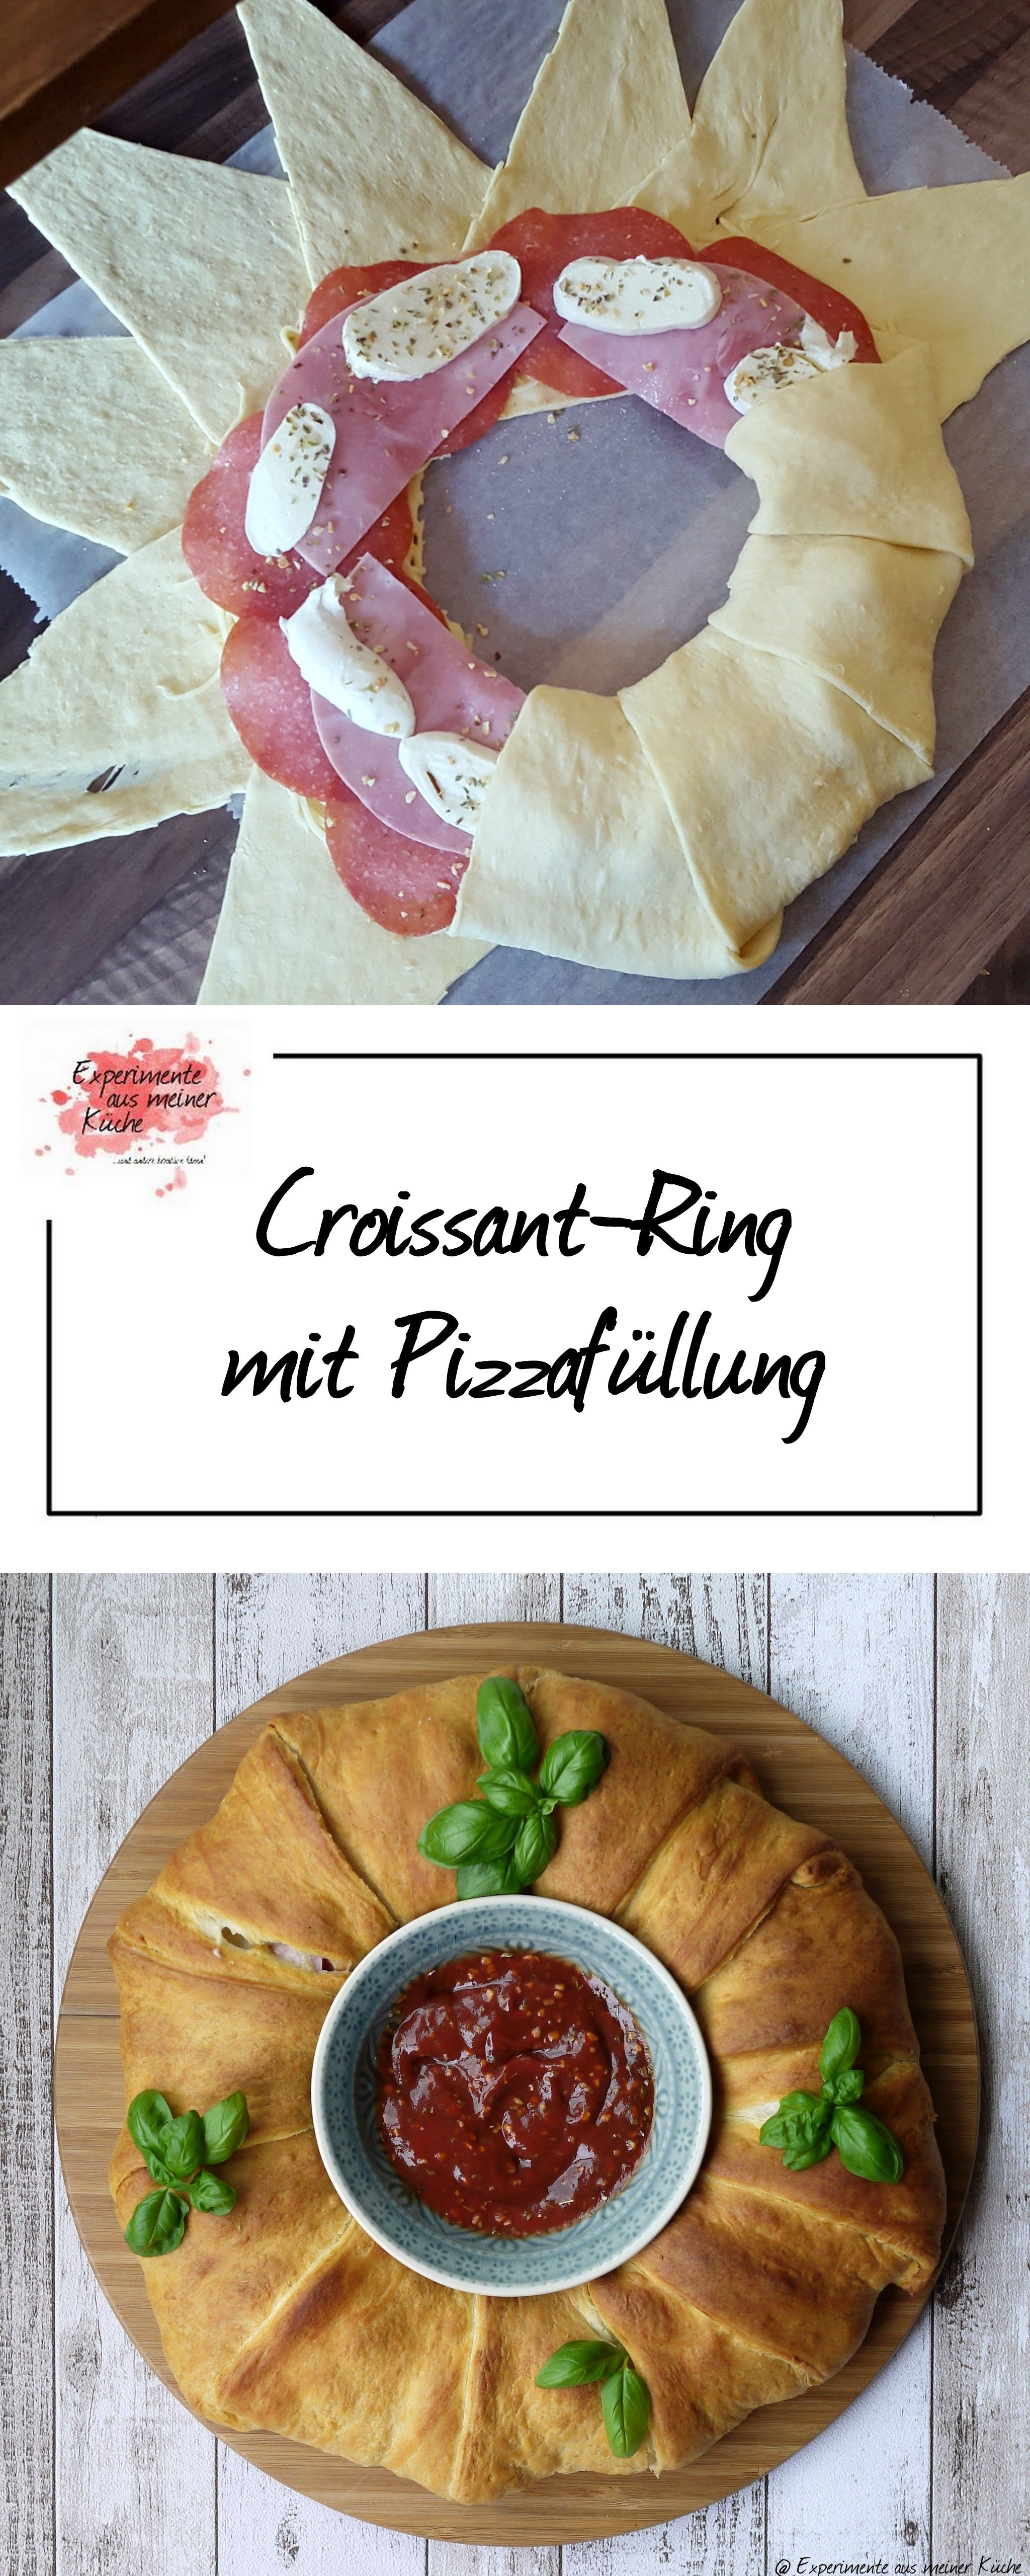 croissant ring mit pizzaf llung blogger summer vibes pinterest backen kuchen und fingerfood. Black Bedroom Furniture Sets. Home Design Ideas